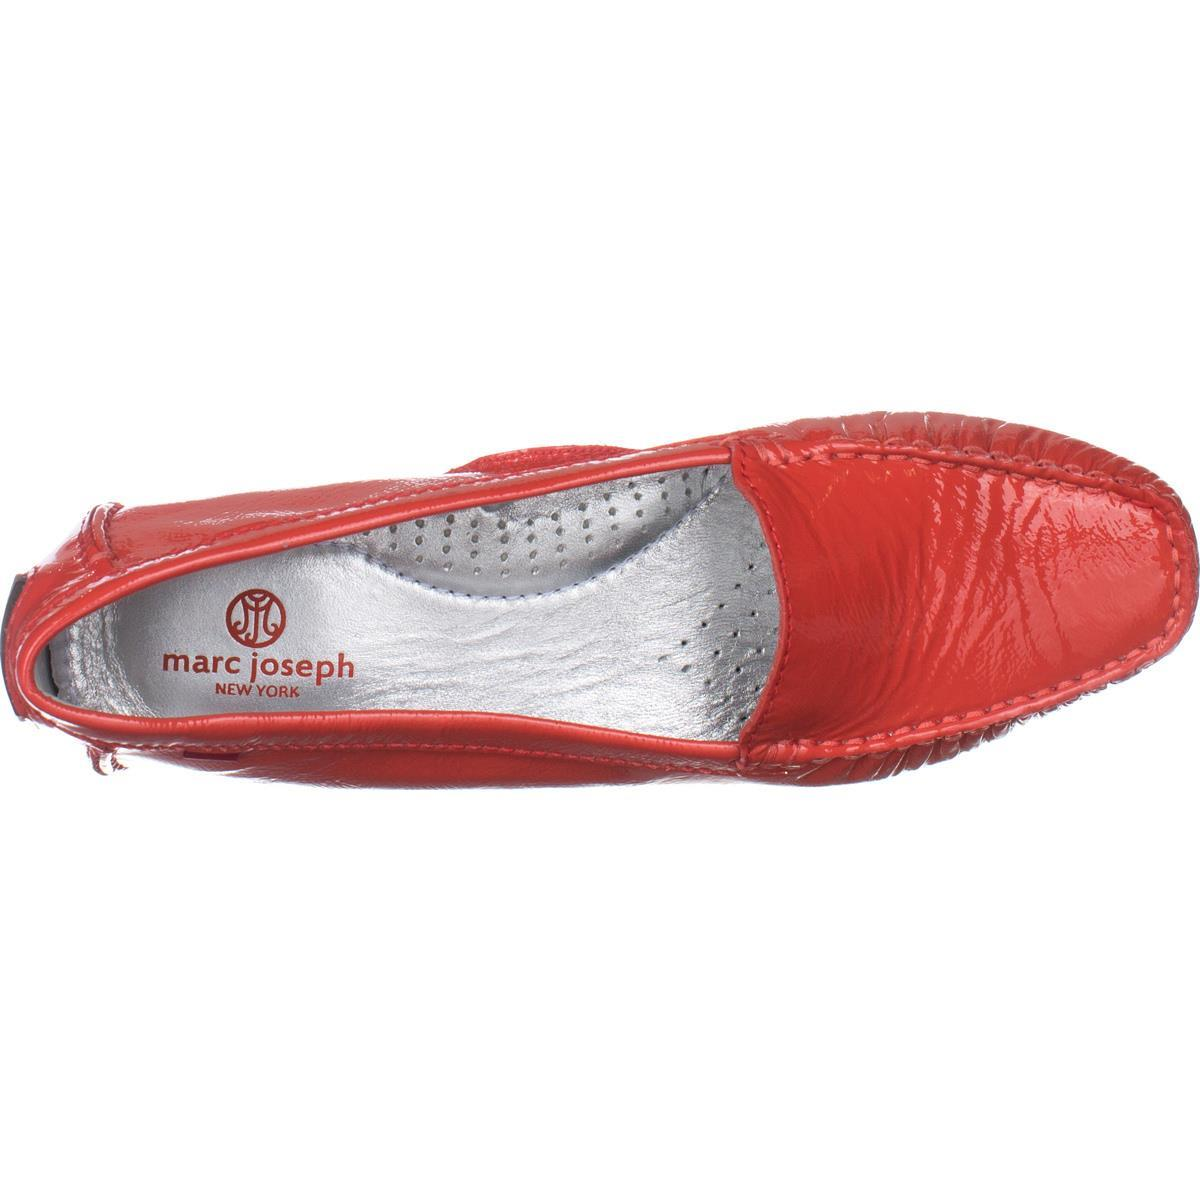 Womens Marc Joseph Manhasset Slip-On Loafers, Coral Patent